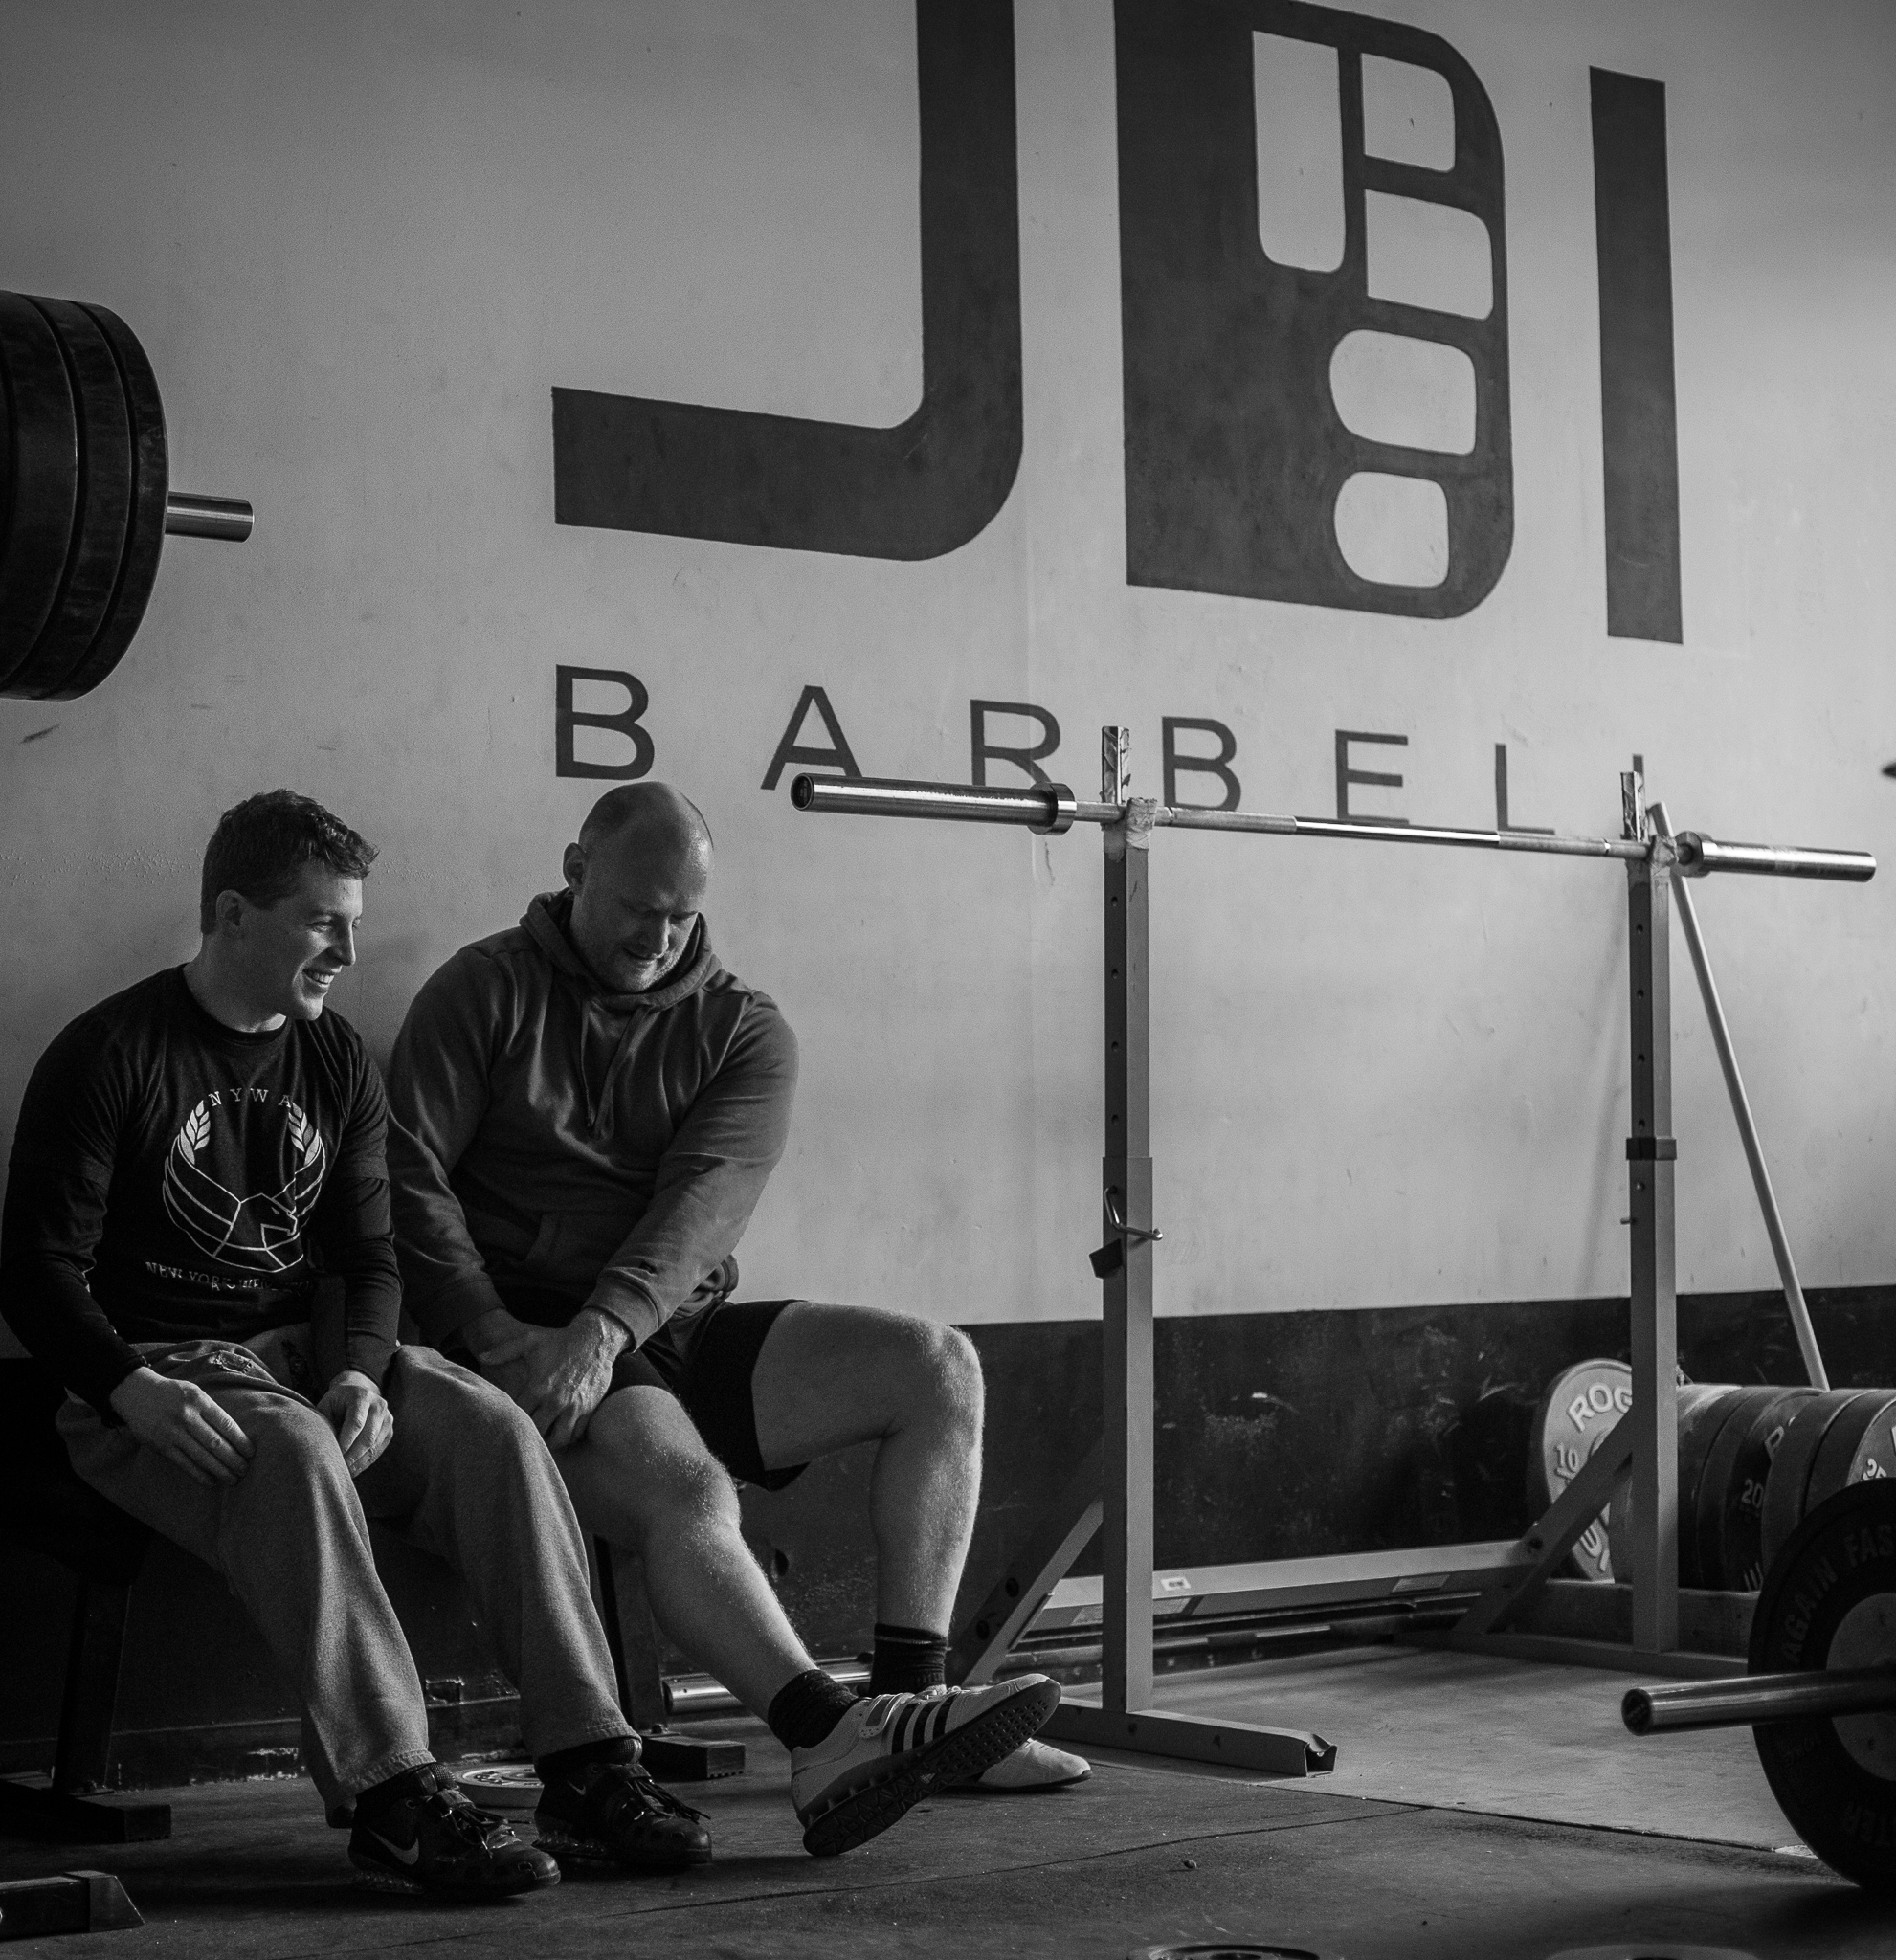 dan-casey-nywa-jdi-visit-weightlifting-coach-new-york-weightlifting-academy-20.jpg